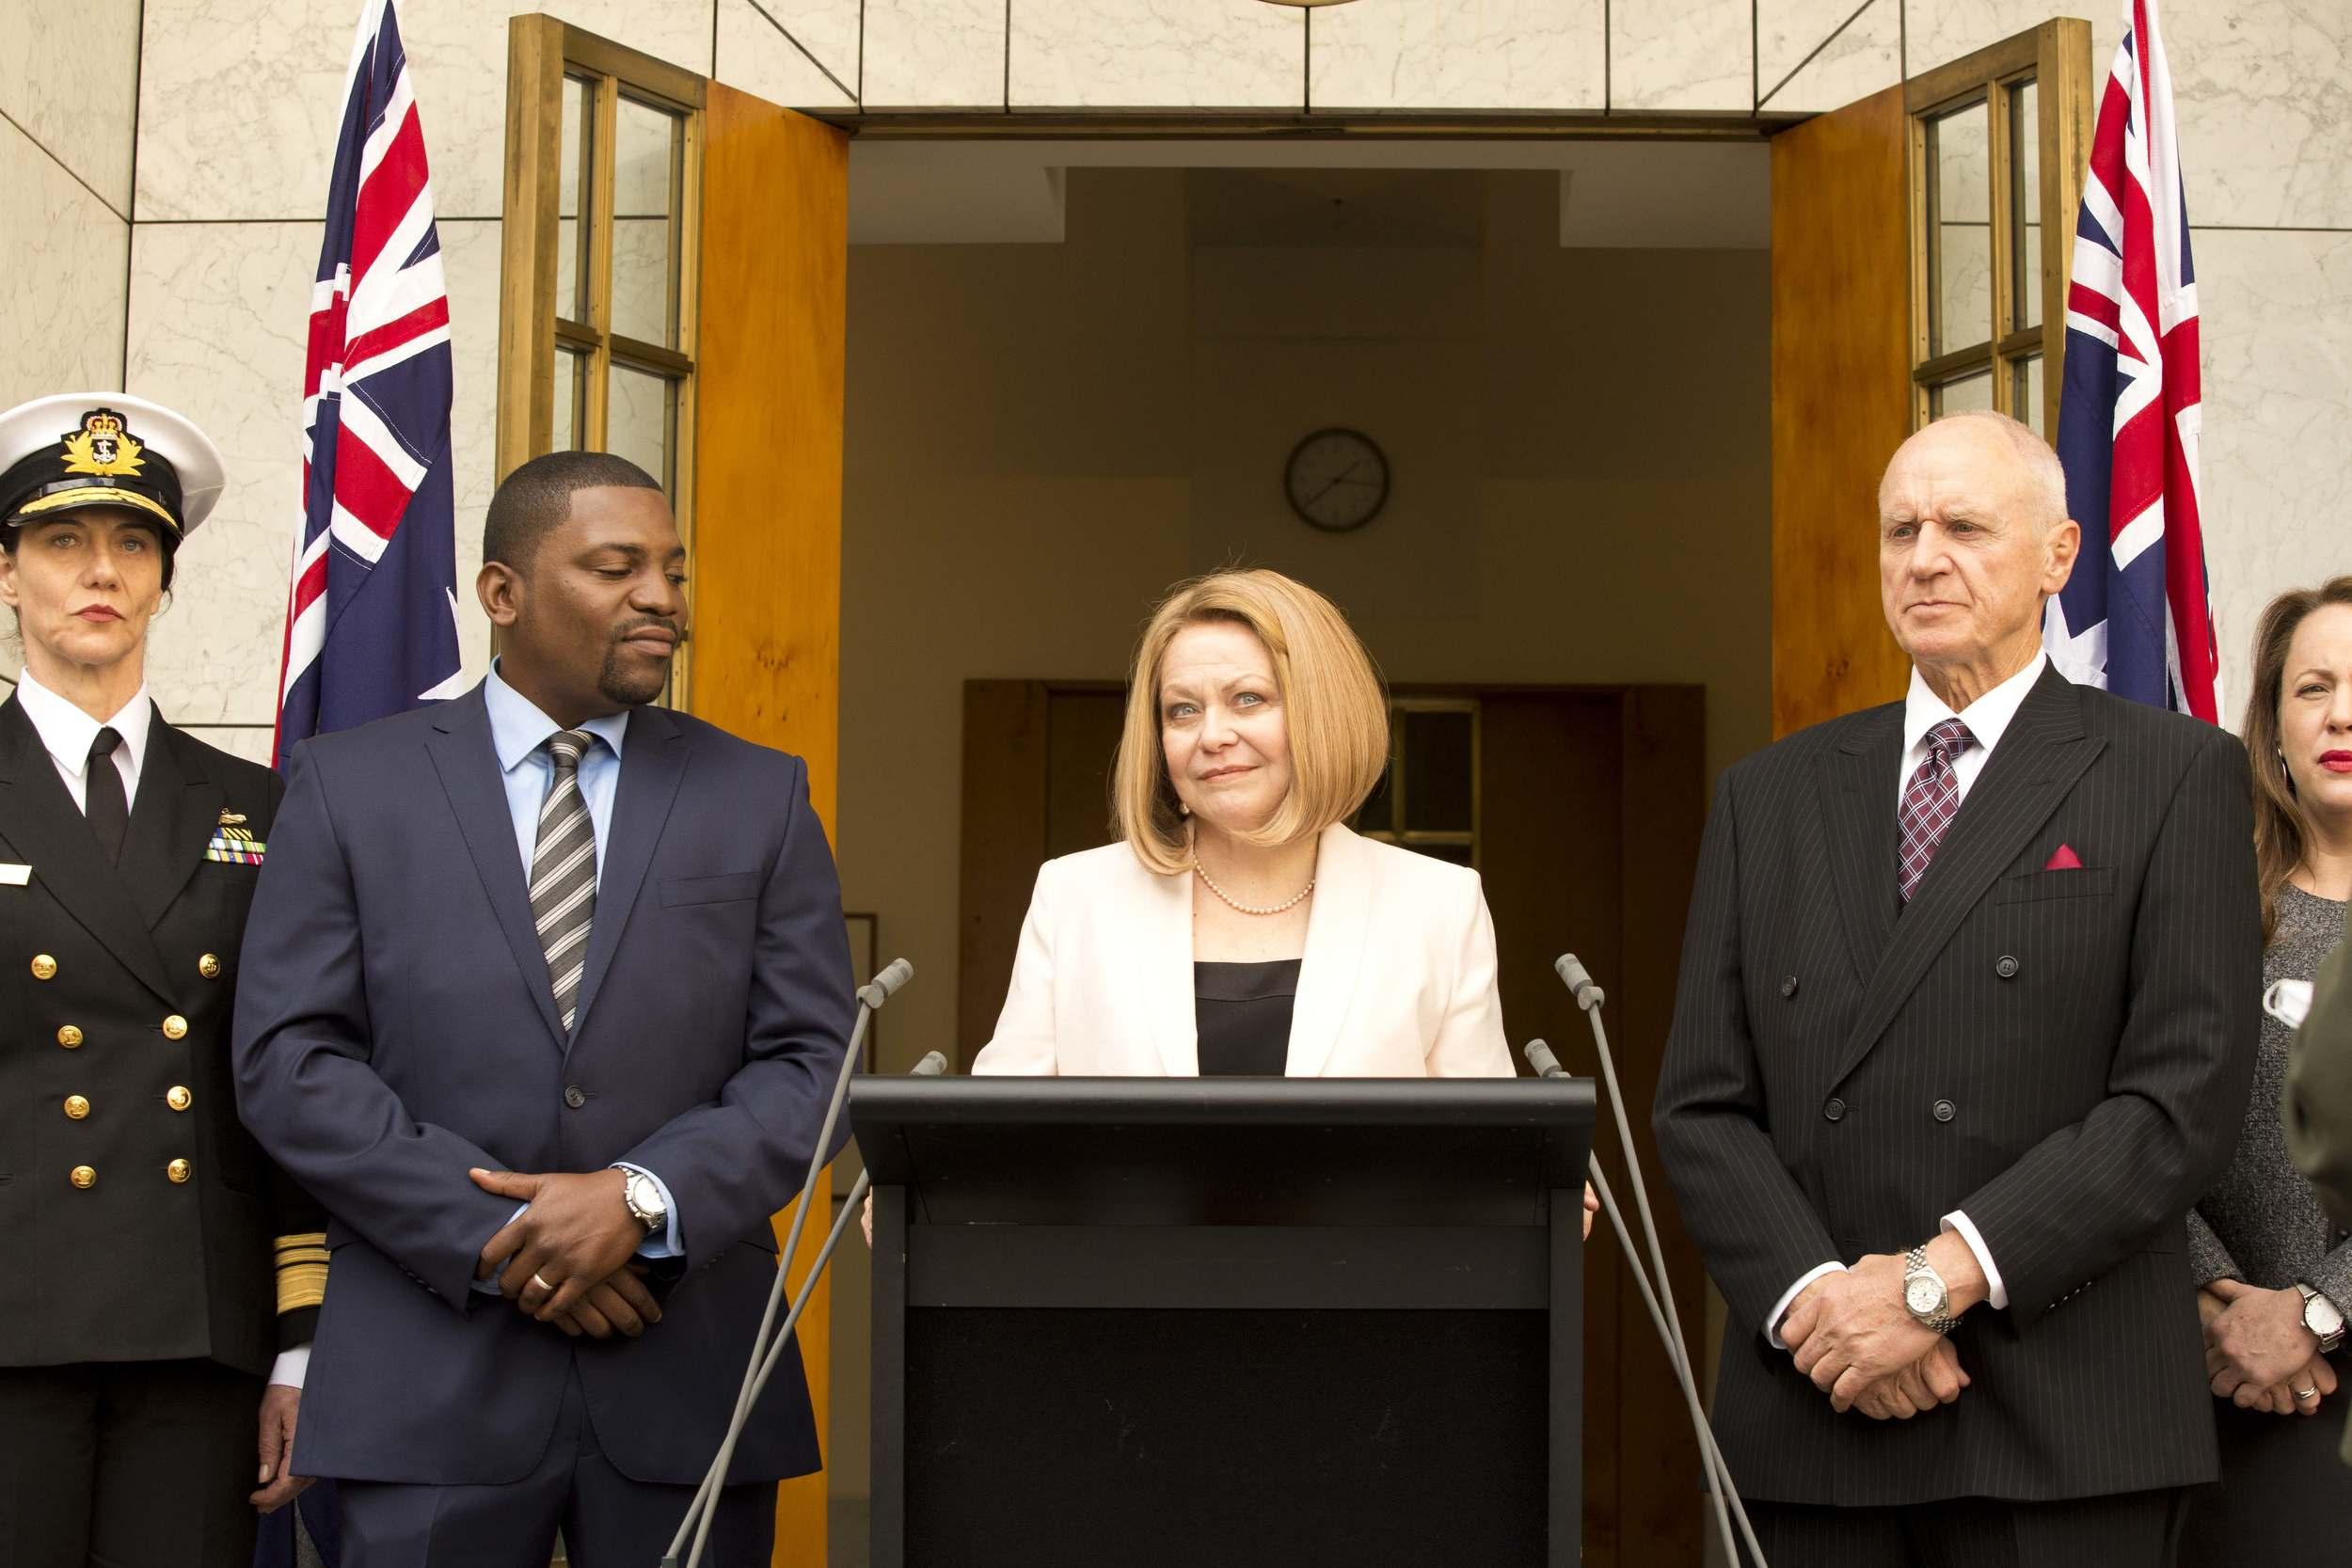 Secret-City-Bailey-Jacki-Weaver-gives-her-speech-re-Safer-Australia-copy.jpg